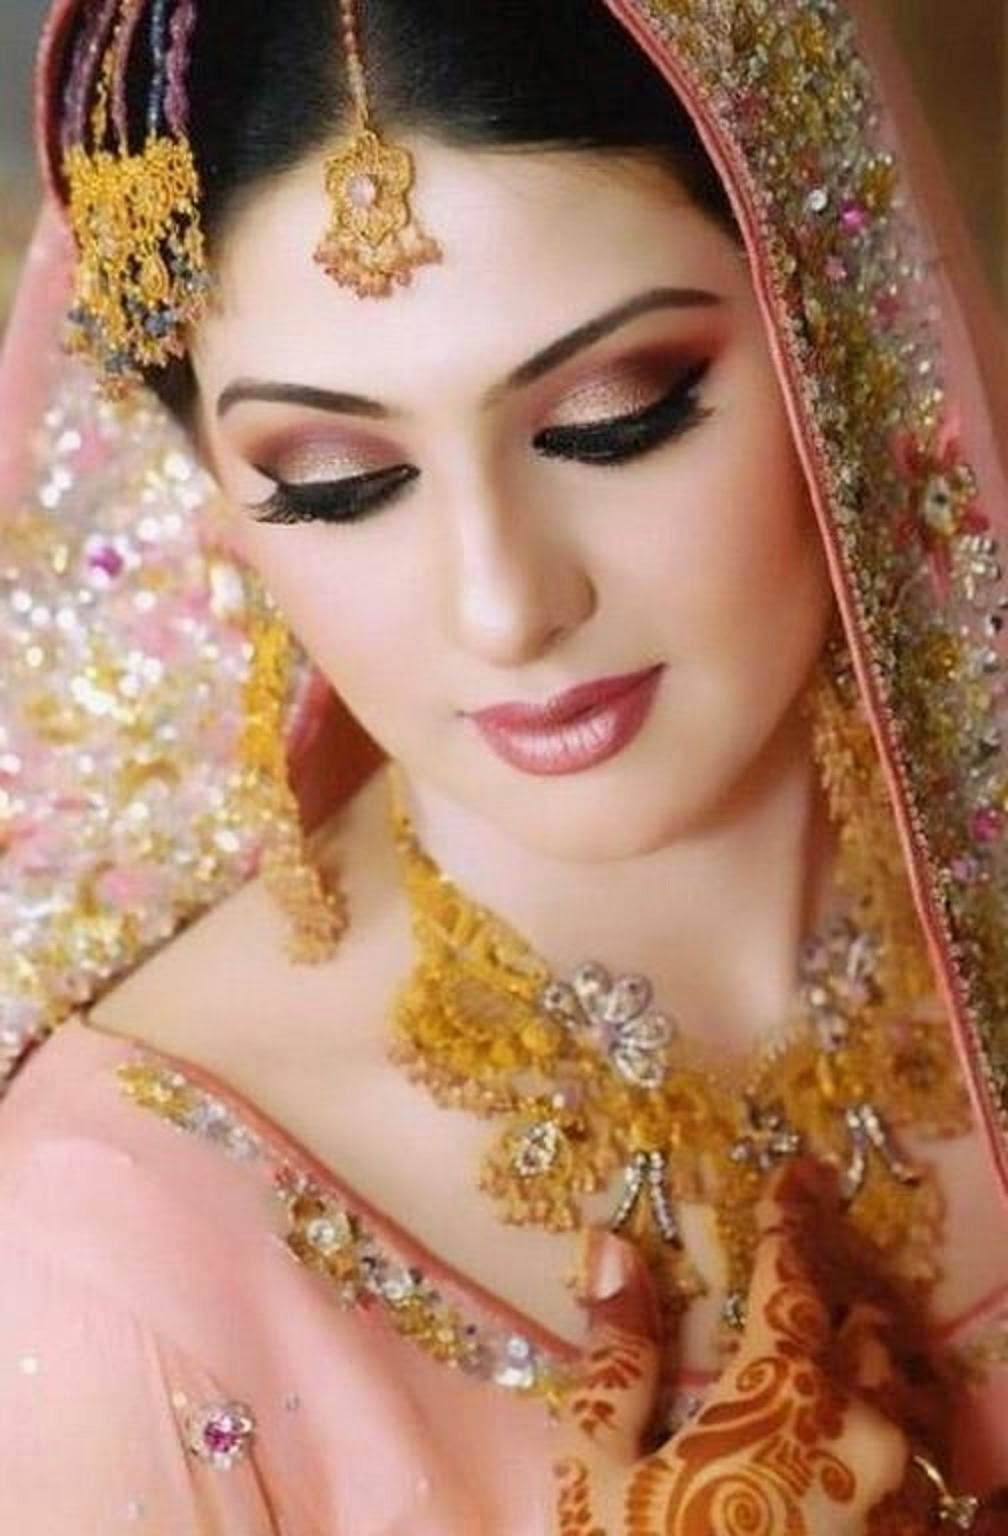 Dulhan Makeup Ideas 2014 For Girls Hd Wallpapers Free Download Indian Bridal Makeup Best Bridal Makeup Indian Wedding Makeup